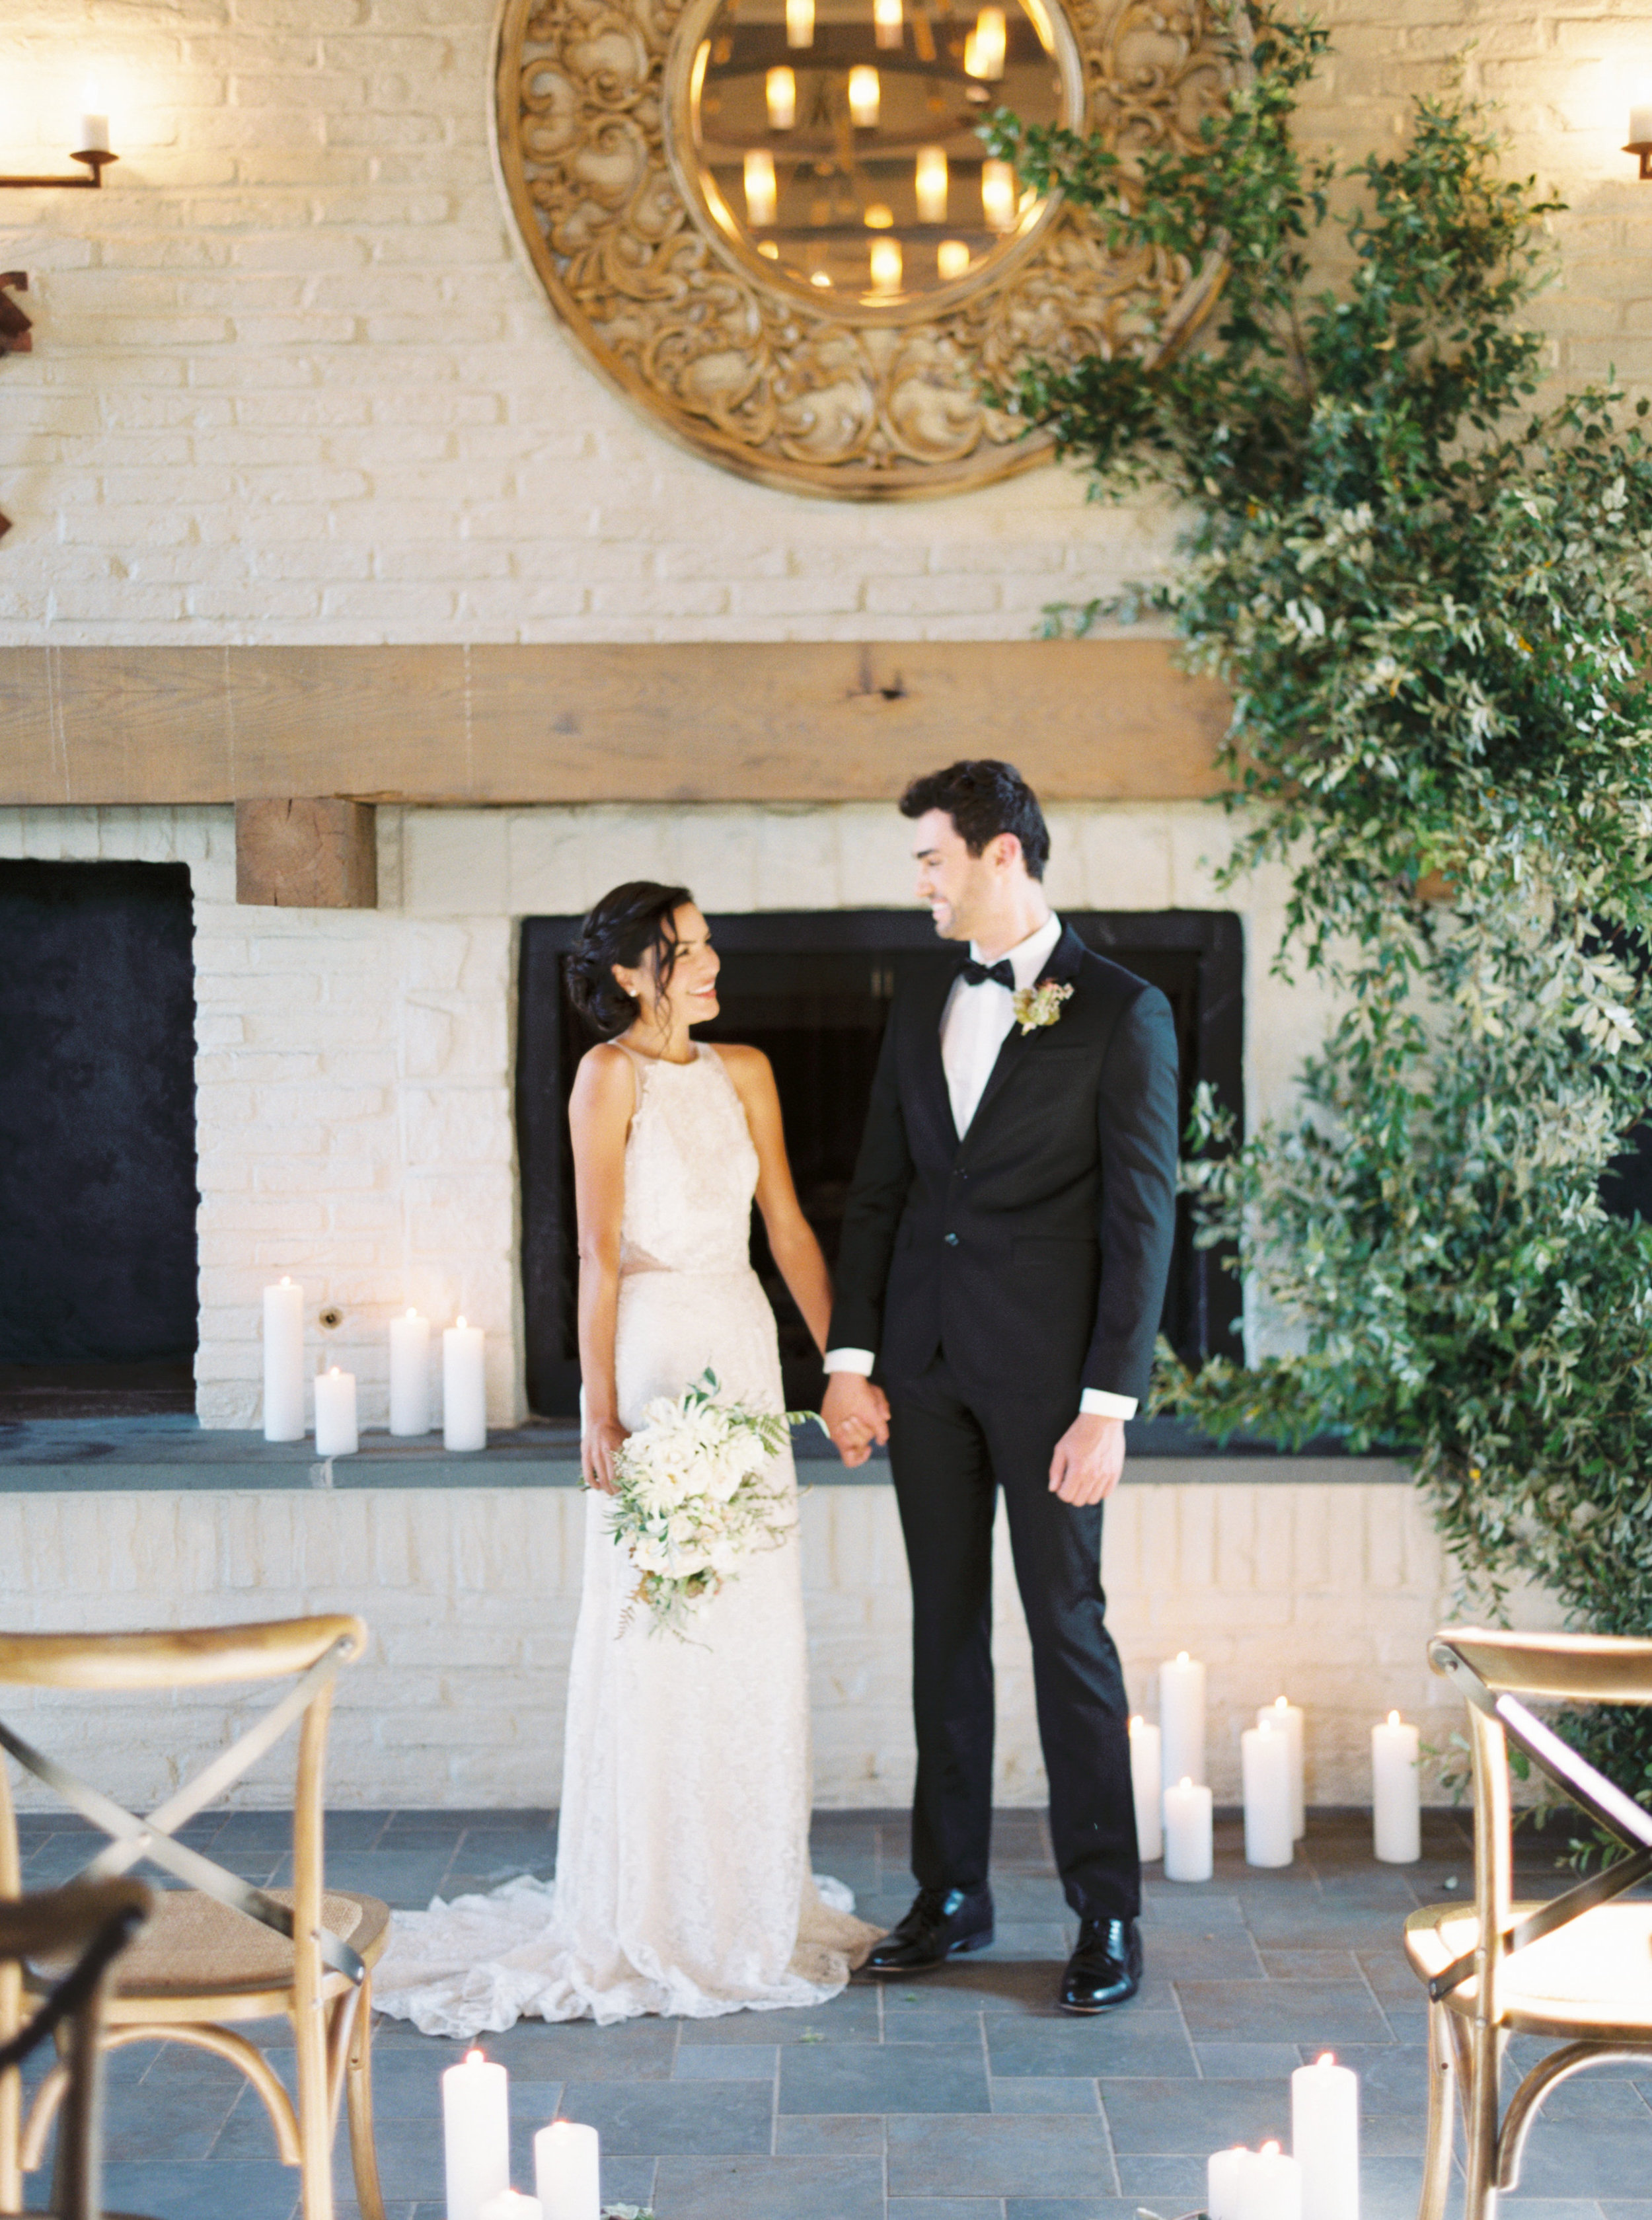 Early Mountain Vineyard Wedding - Wild Green Yonder Flowers